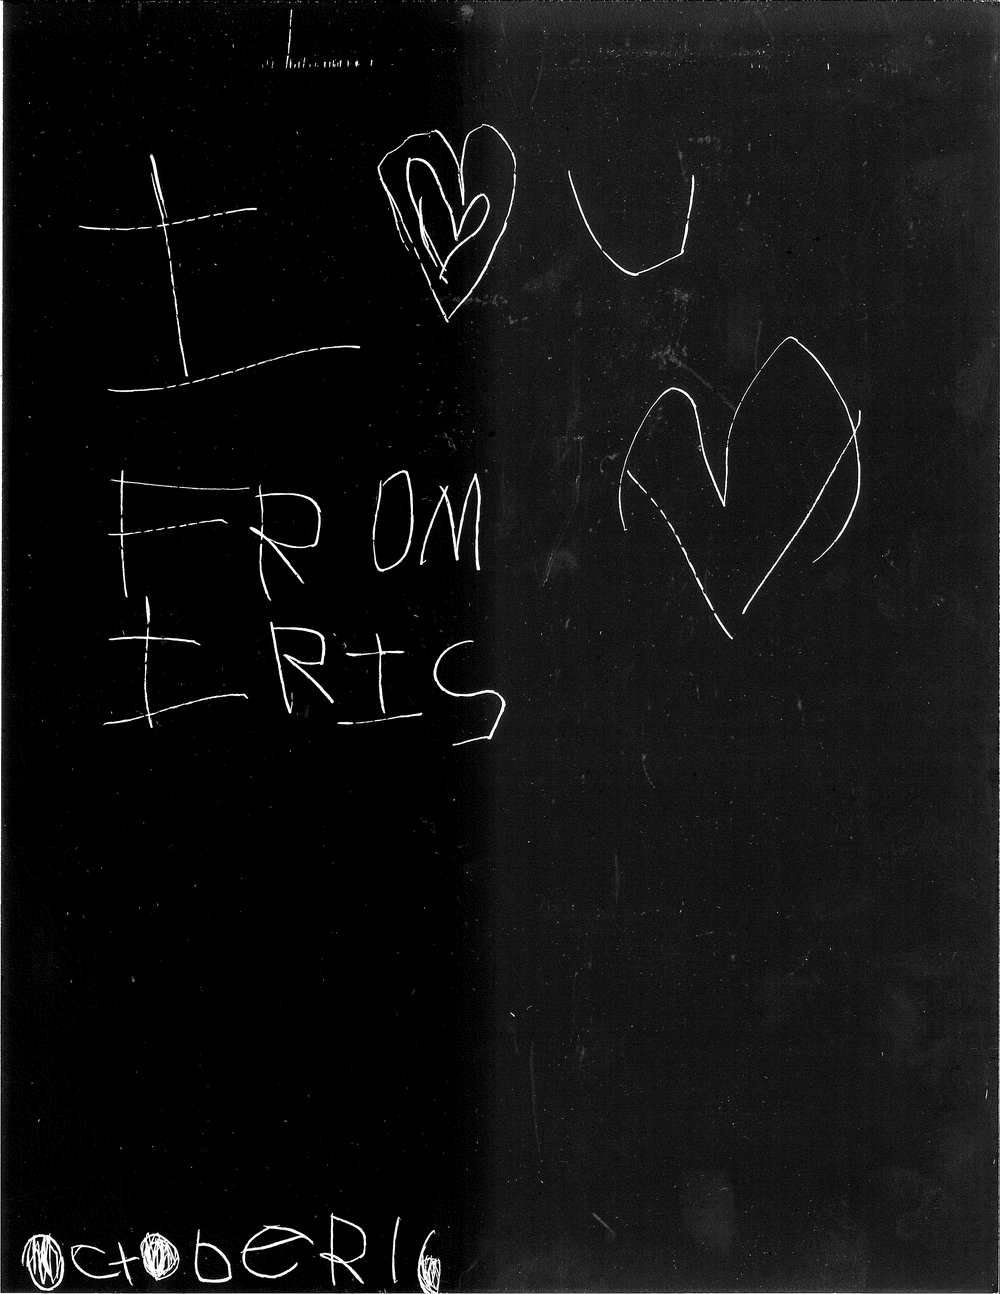 i love you from Iris.jpg